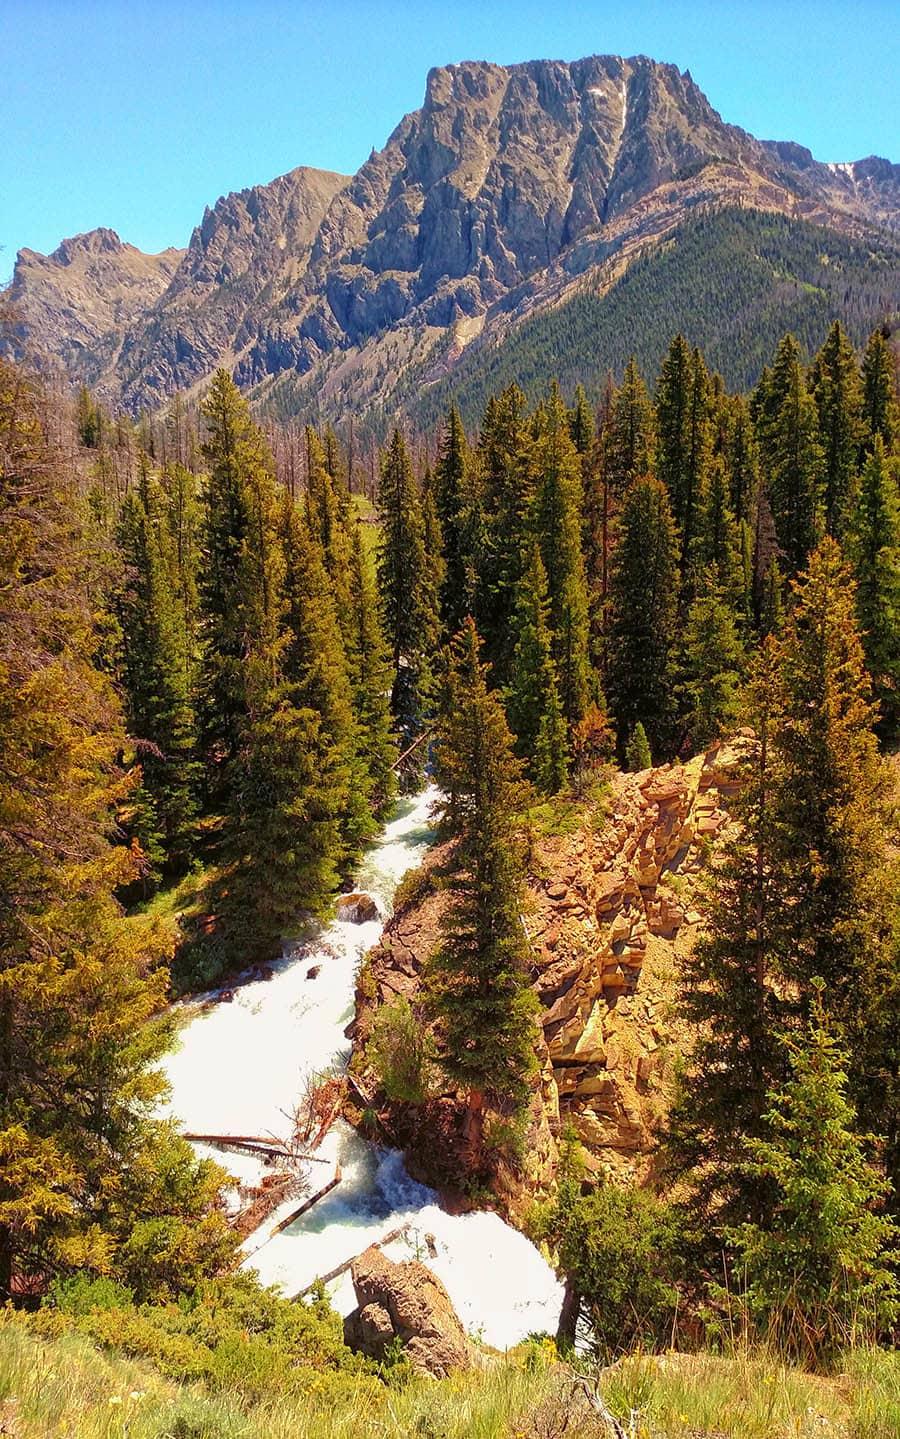 Flat Top Mountain over Clear Creek waterfall